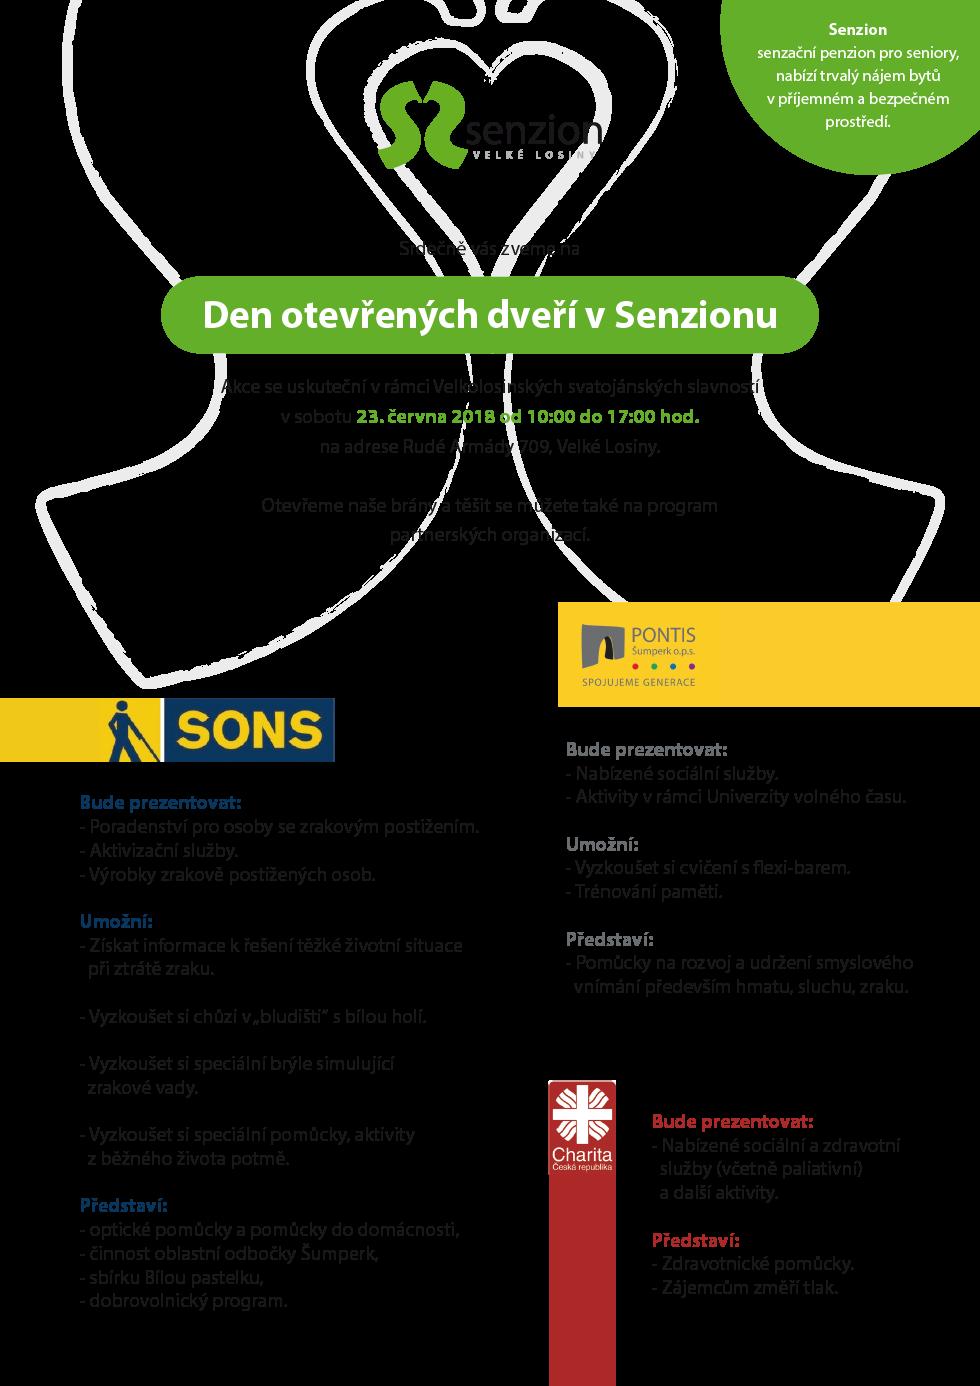 senzion_den_otevrenych_dveri_2018